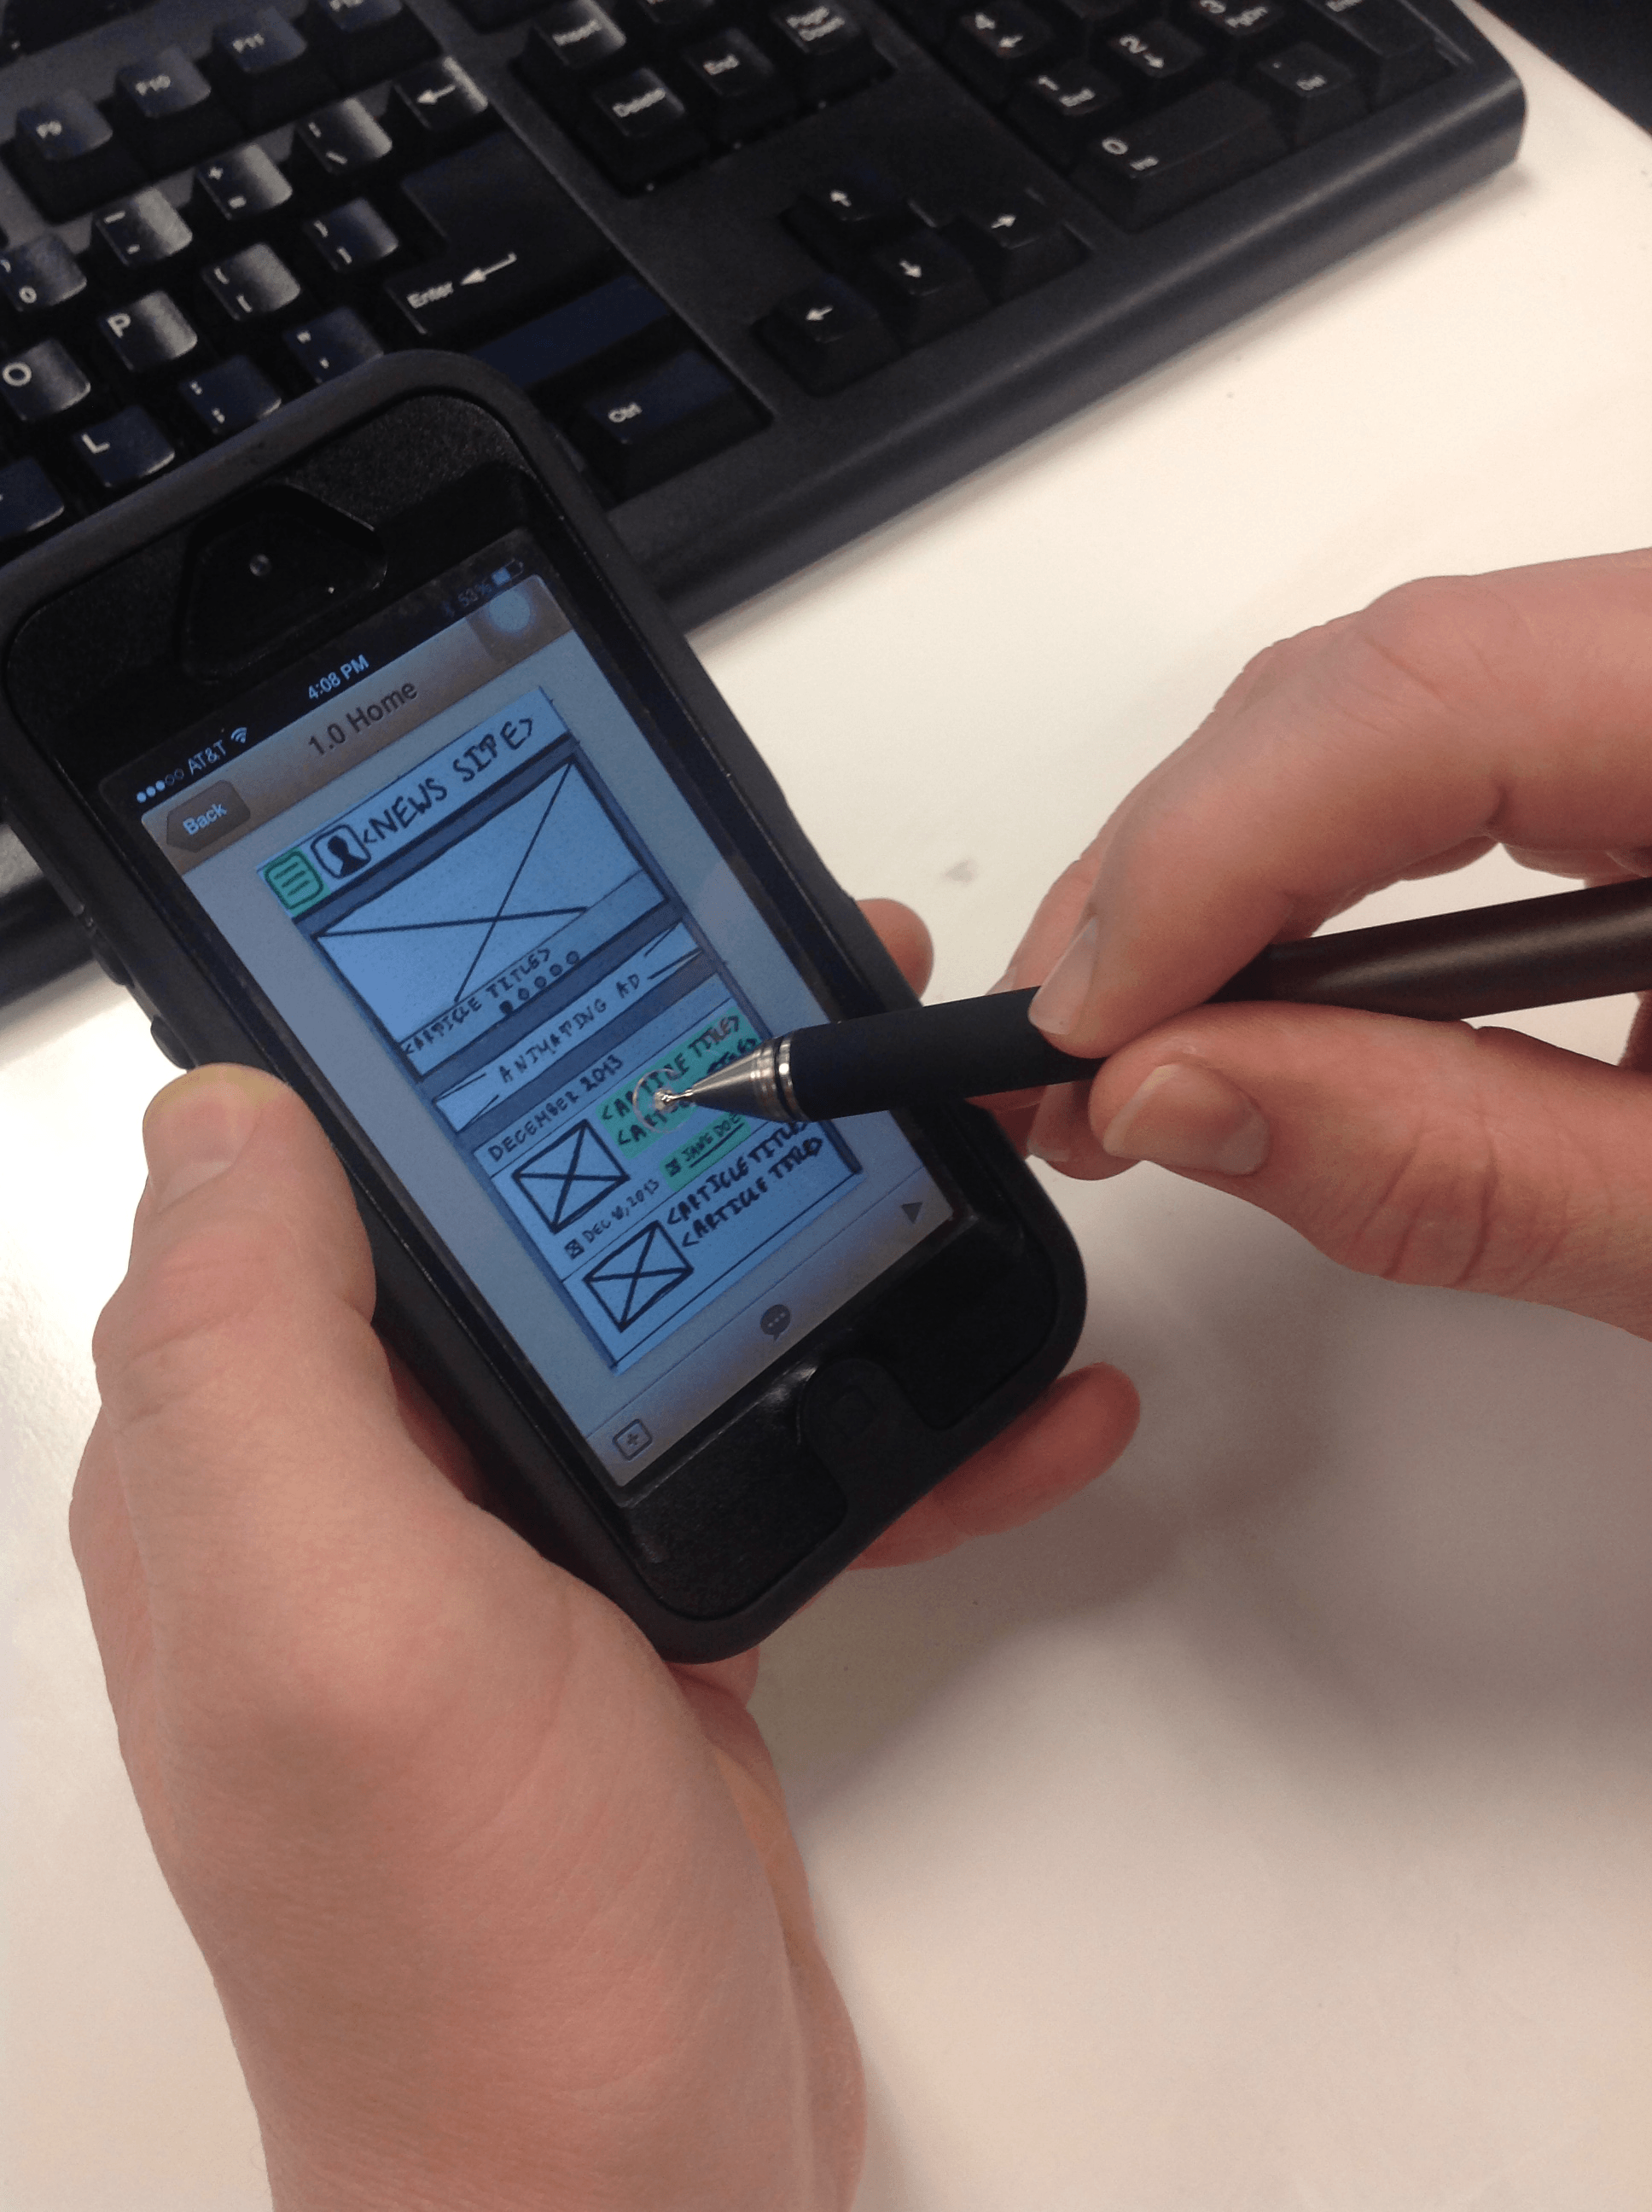 Example of stylus input